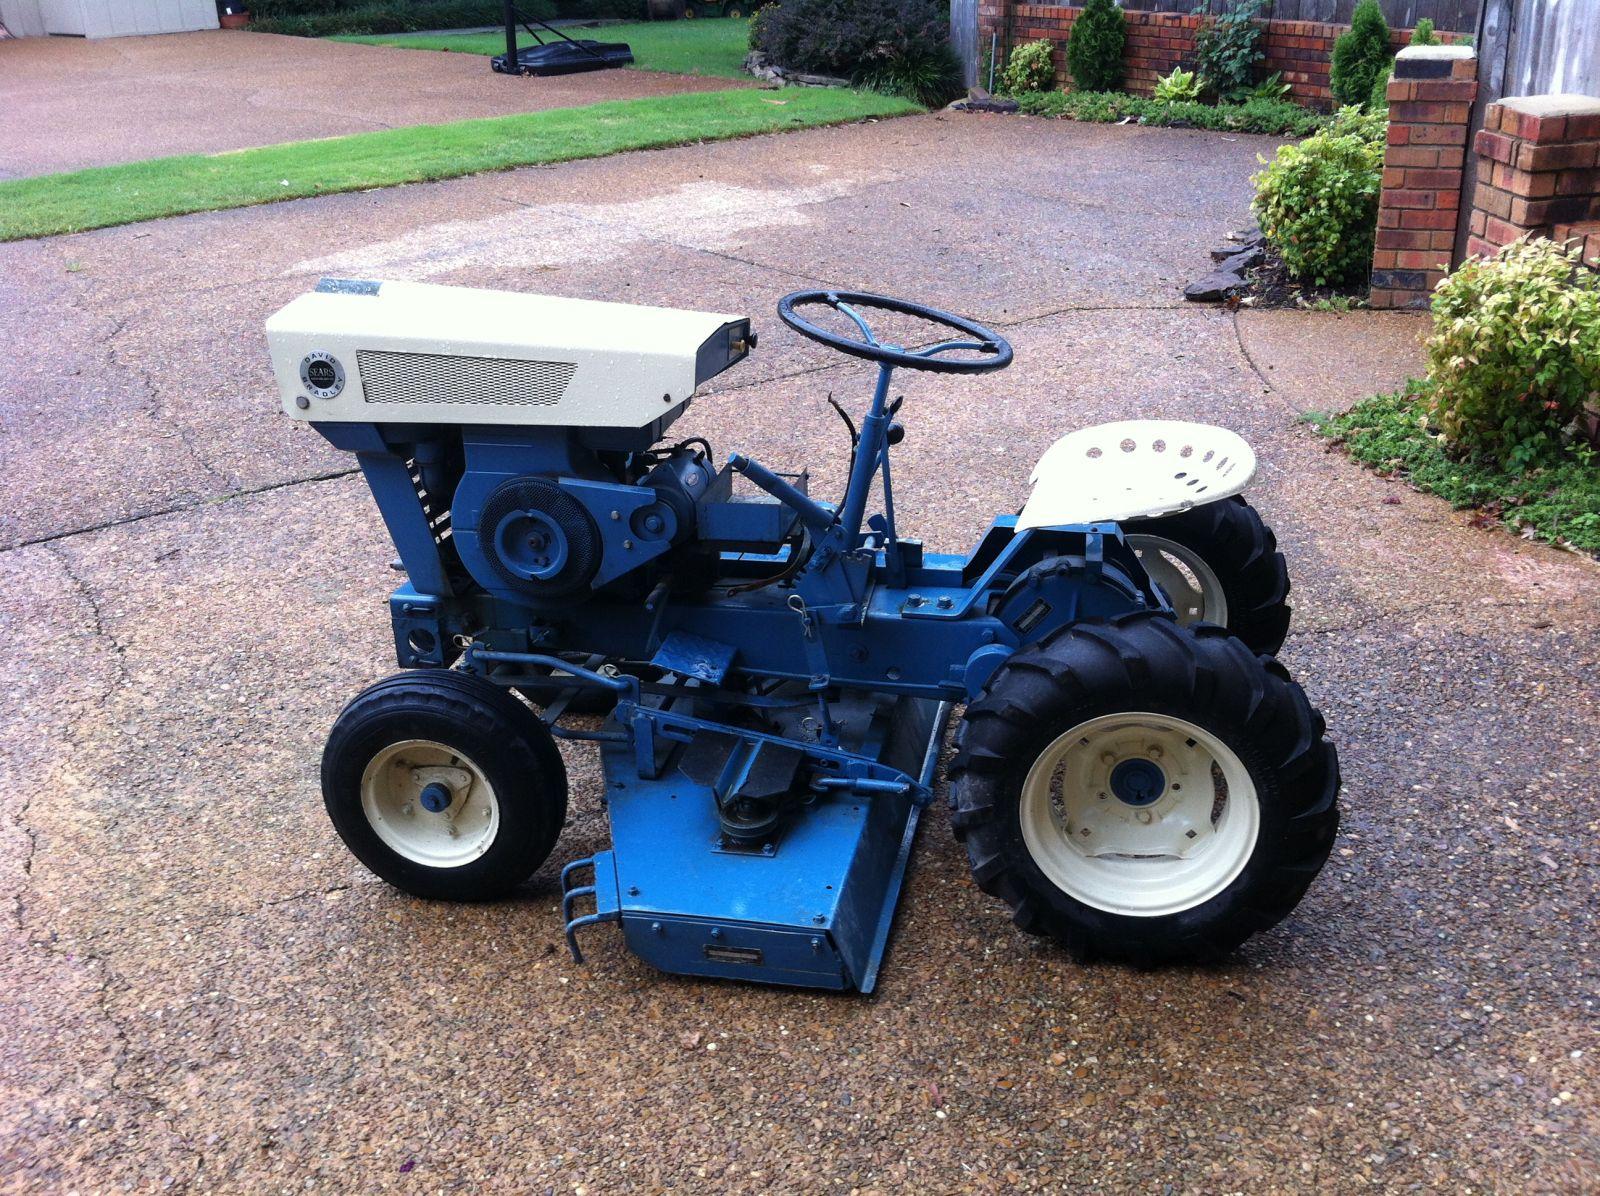 john deere 317 lawn tractor wiring diagram featherlite weedeater fuel line kohler service ~ odicis